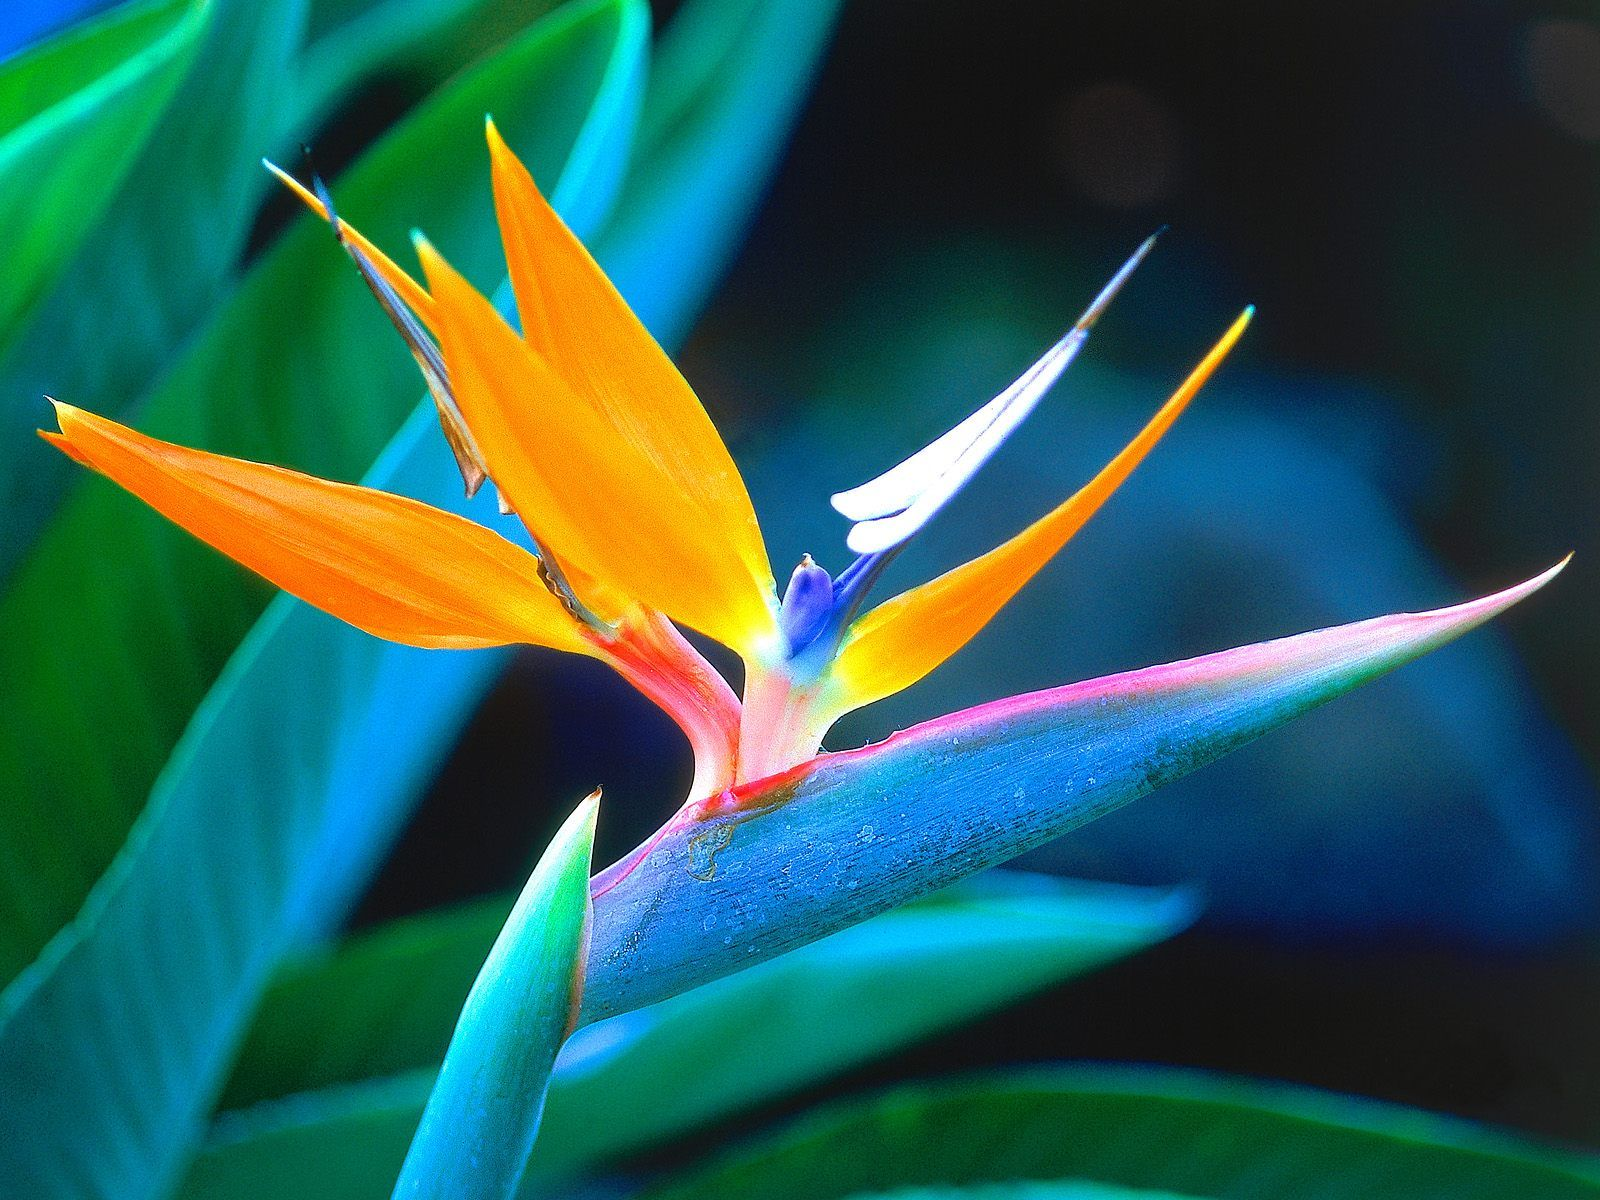 http://2.bp.blogspot.com/_H0GuC4x9jag/S7cKxm1ikwI/AAAAAAAAA9c/wtgseEjLF3w/s1600/Flori+Desktop+Wallpapers+Poze+cu+Flori+Hawaii.jpg